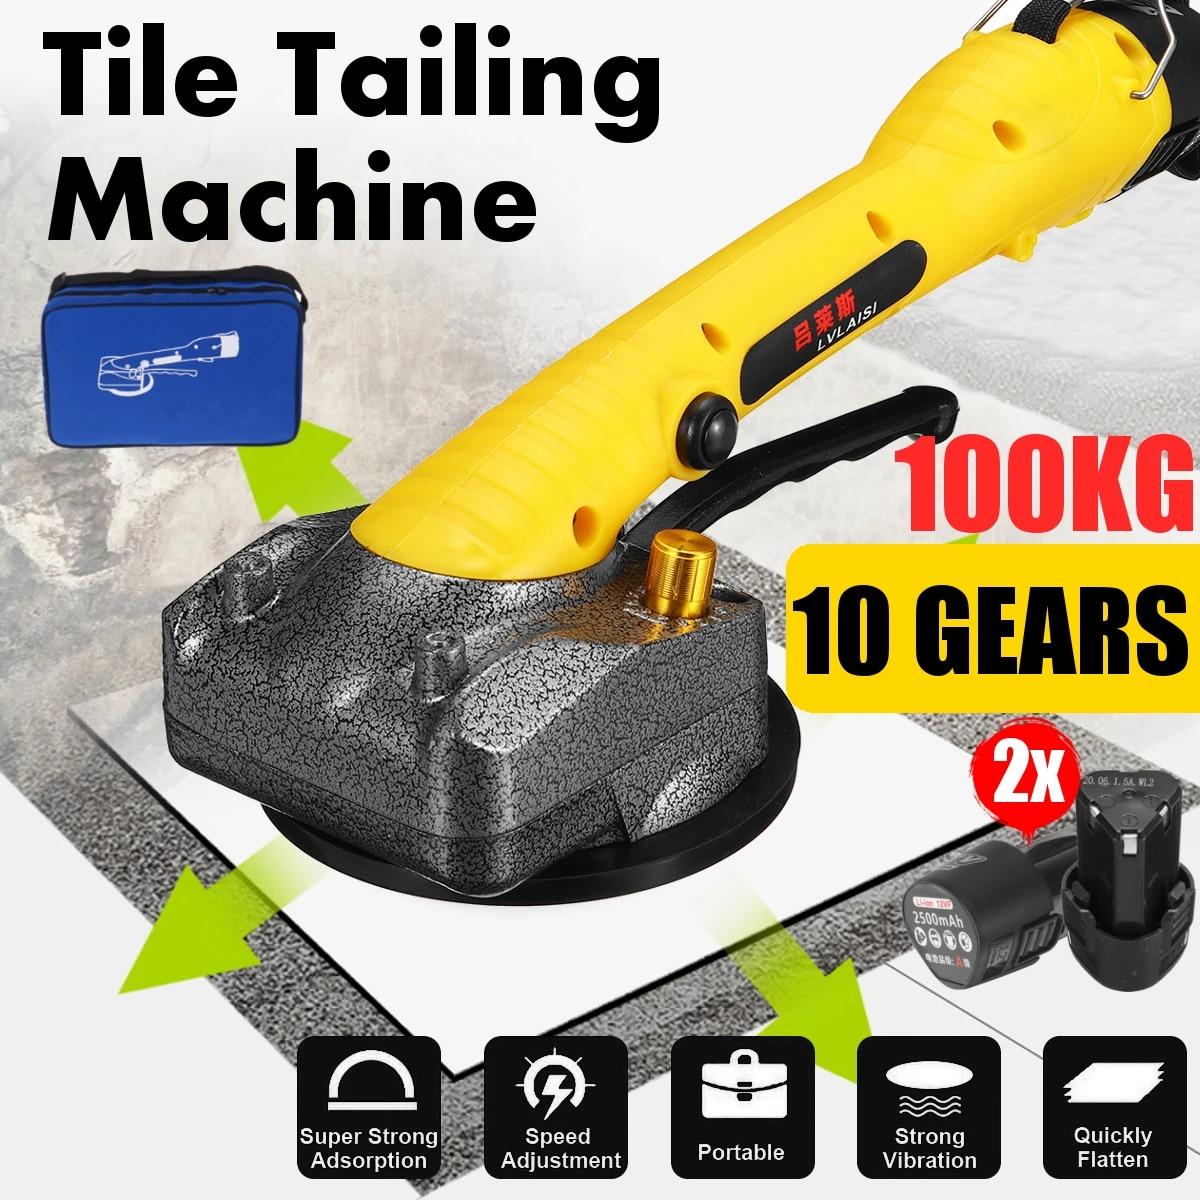 20W Tiling Tiles Machine can suck 20KG Tiles Vibrator Suction Cup  Adjustable Protable Automatic Floor Vibrator Leveling Tool